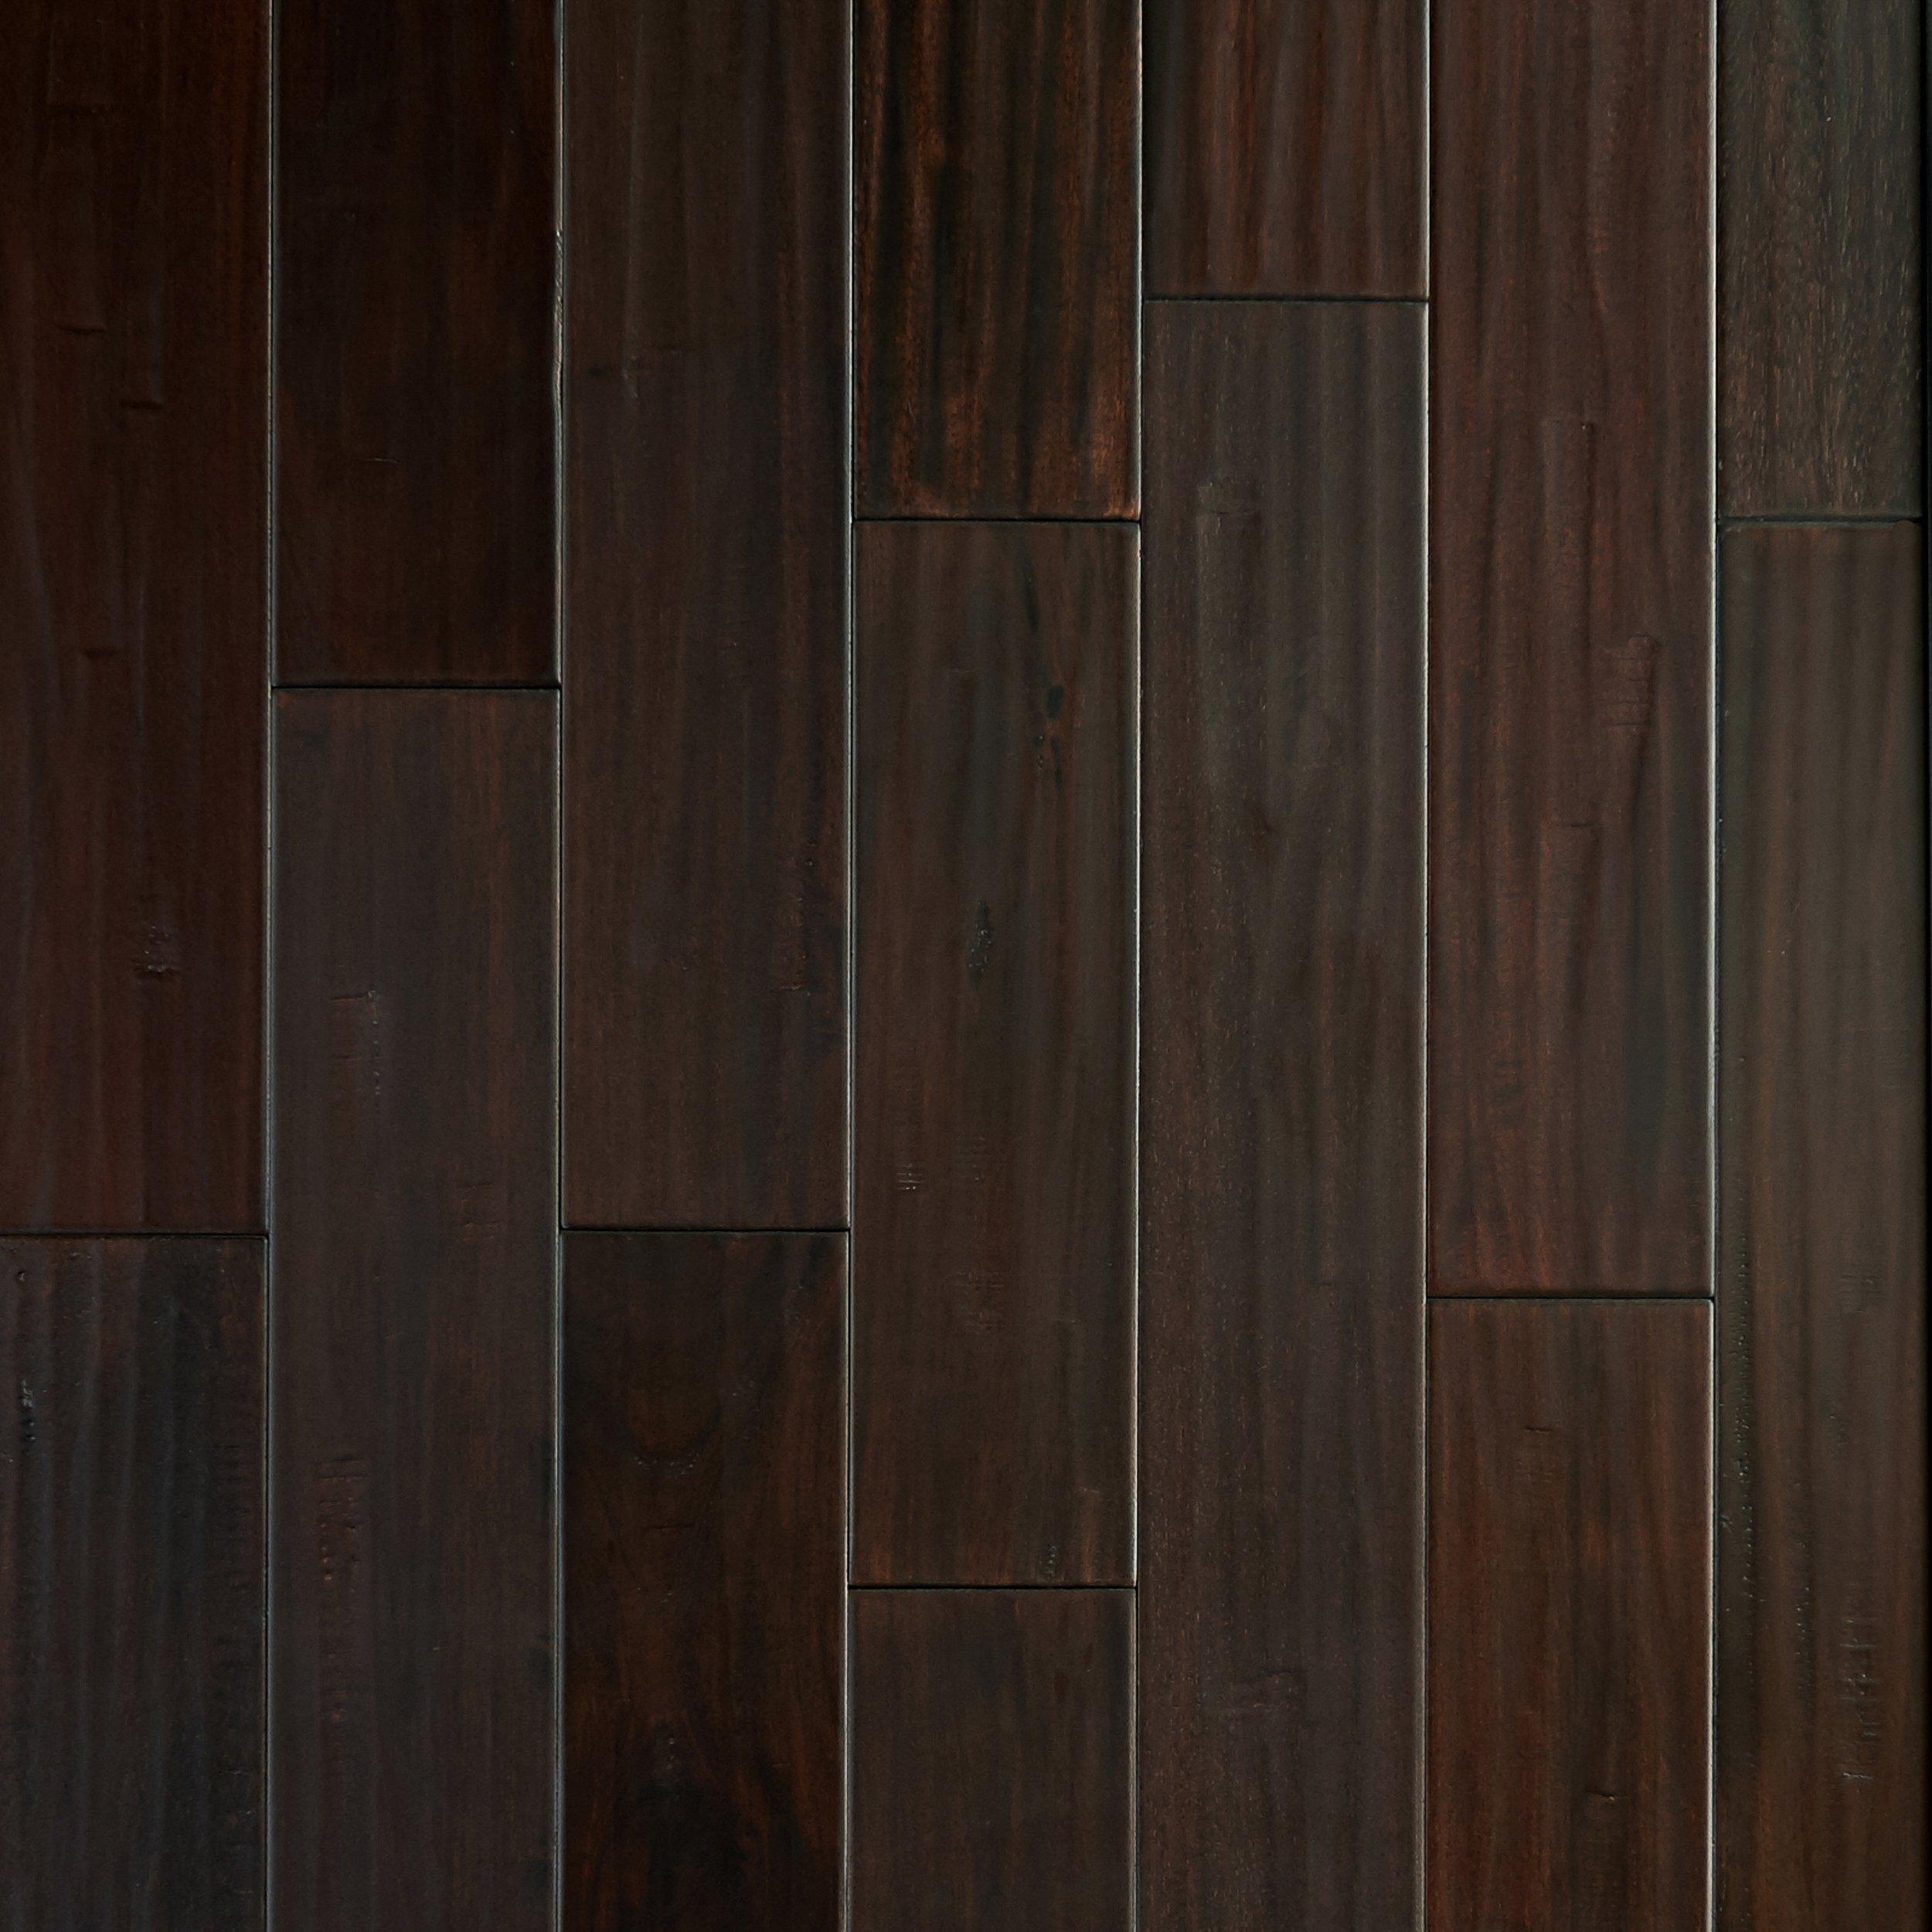 Mahogany Dark Hand Scraped Solid Hardwood   5/8in. X 4 3/4in.   942604157    Floor And Decor